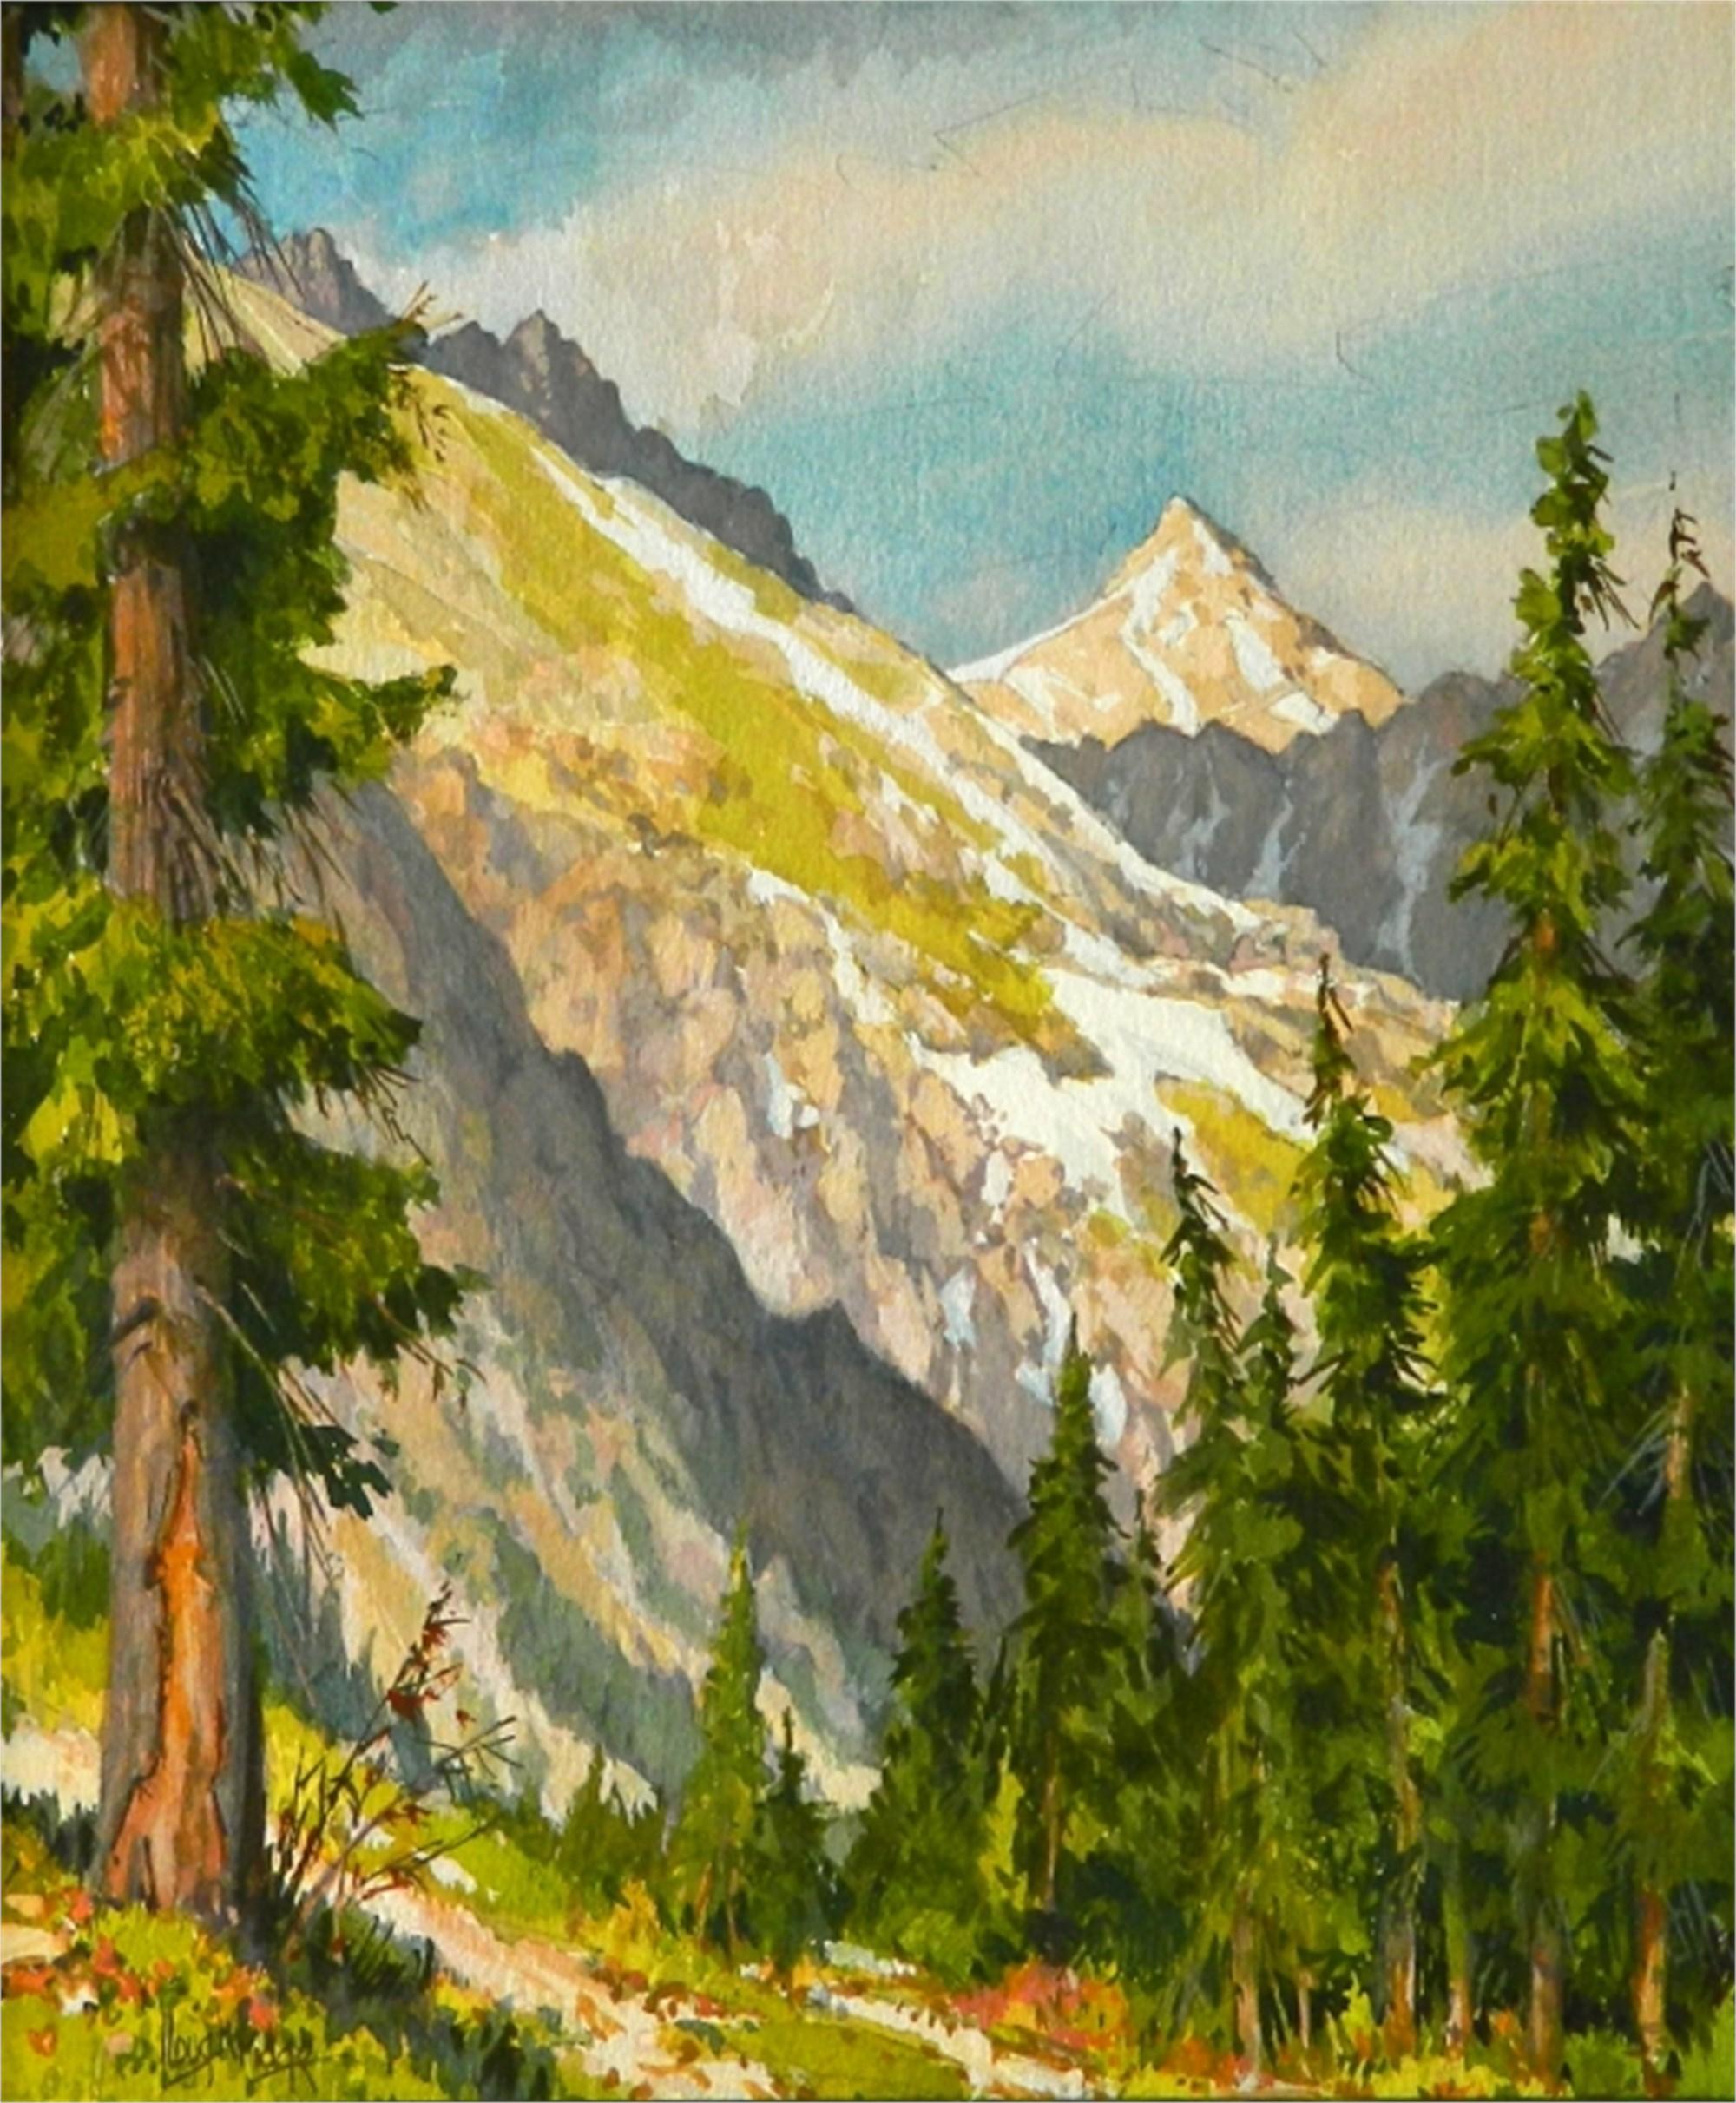 Crystal Peak, Across Valley by Leon Loughridge